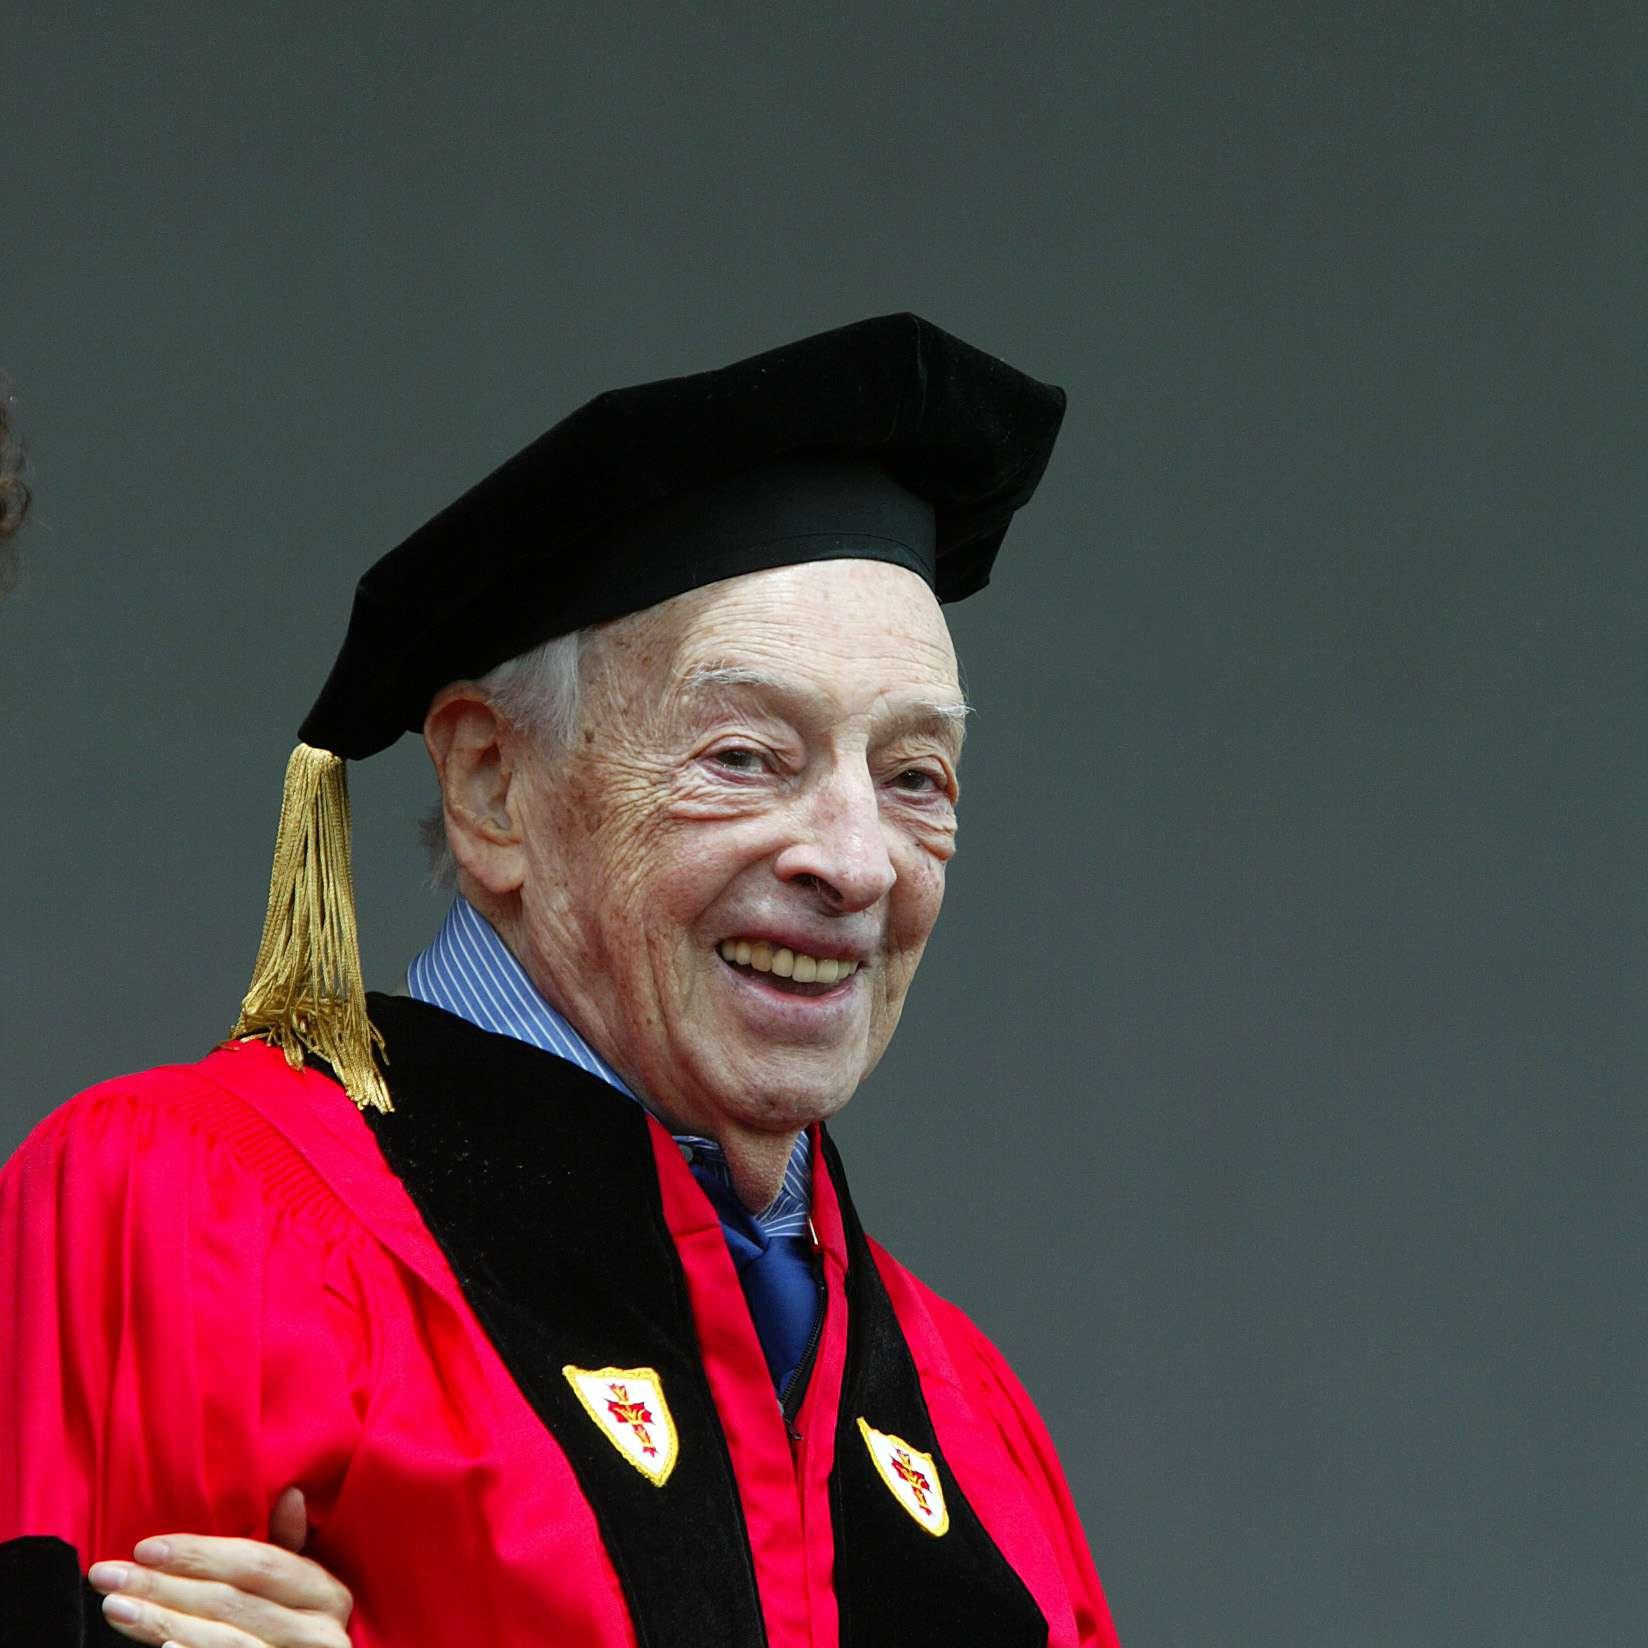 Nobel Laureate Saul Bellow Dies